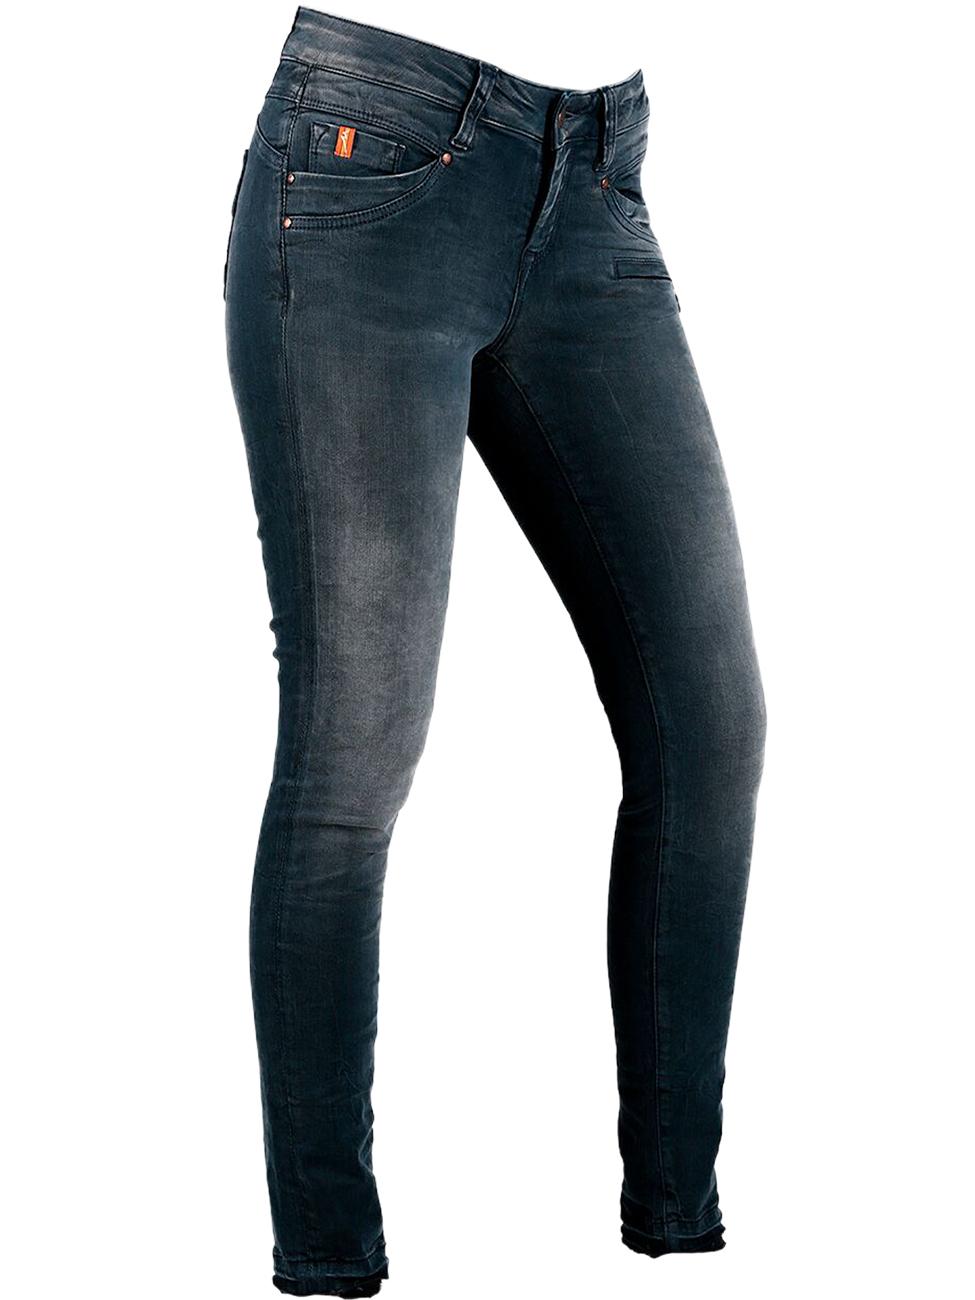 MOD Damen Jeans Suzy Skinny Fit Blau Osman Blue